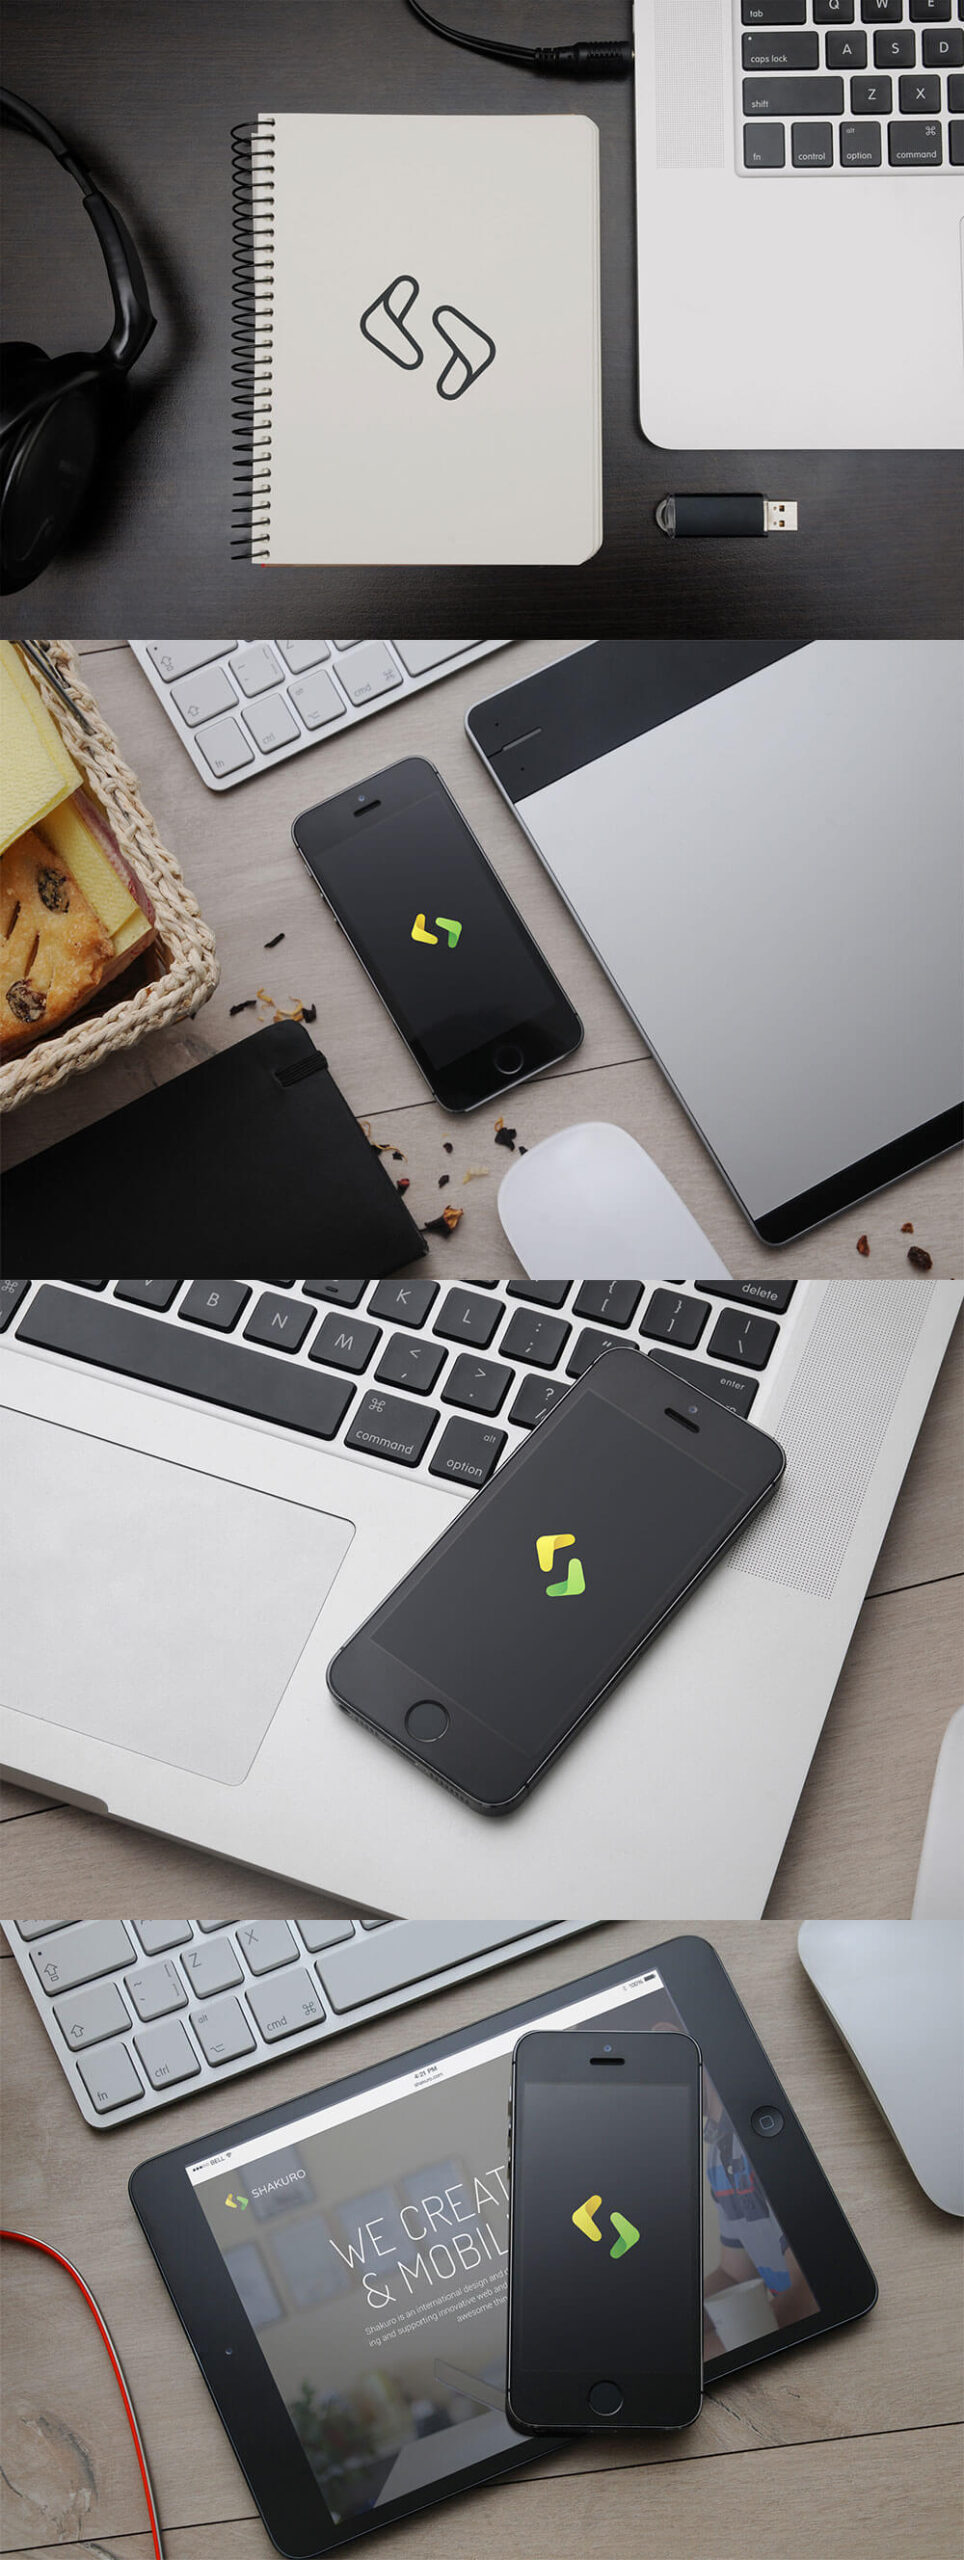 Free iPhone 5, iPad and Macbook Mockups PSD Templates1 (1)